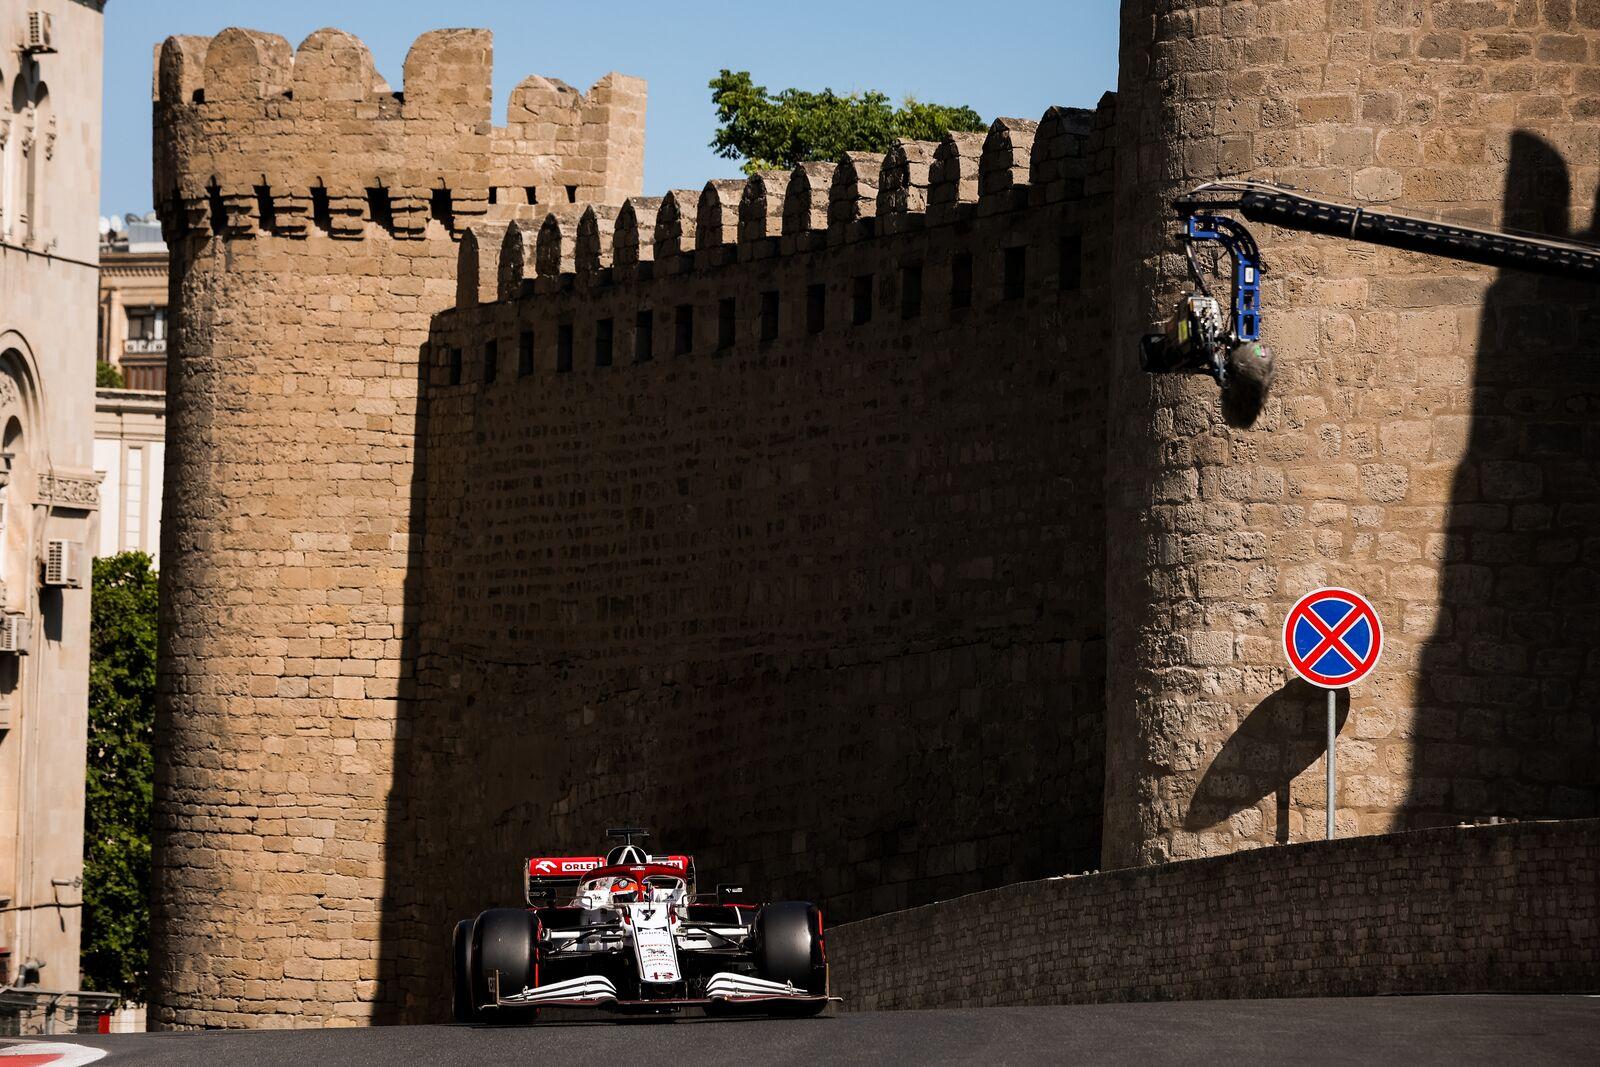 2021 formula 1 Azerbaijan GP